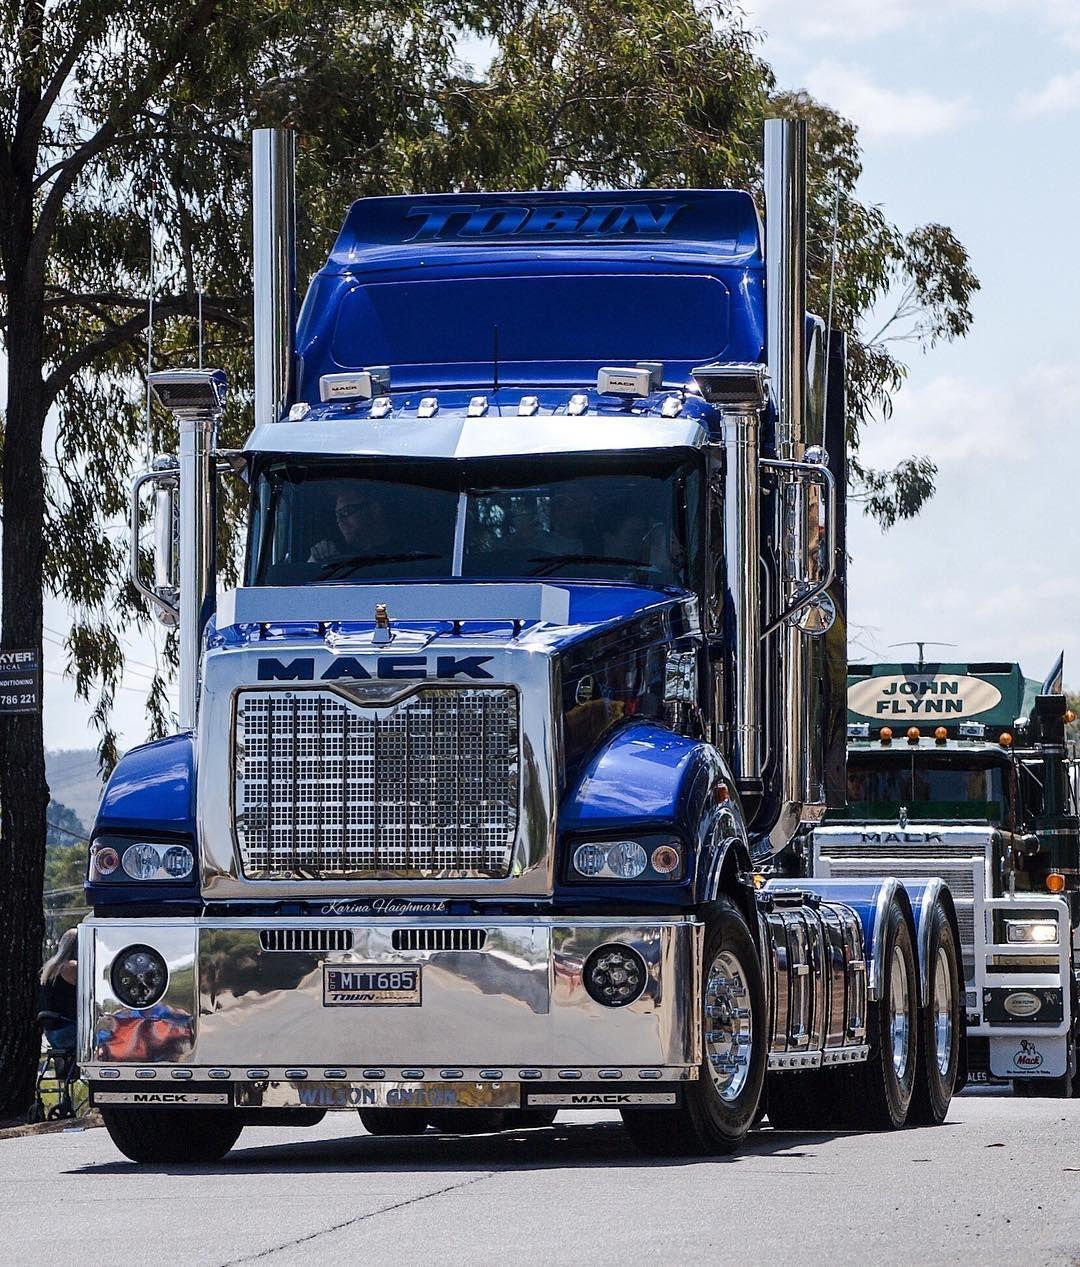 tobins wilsonanton mack truck macktrucksaustralia lightsonthehill2018 macktrucks [ 1080 x 1267 Pixel ]